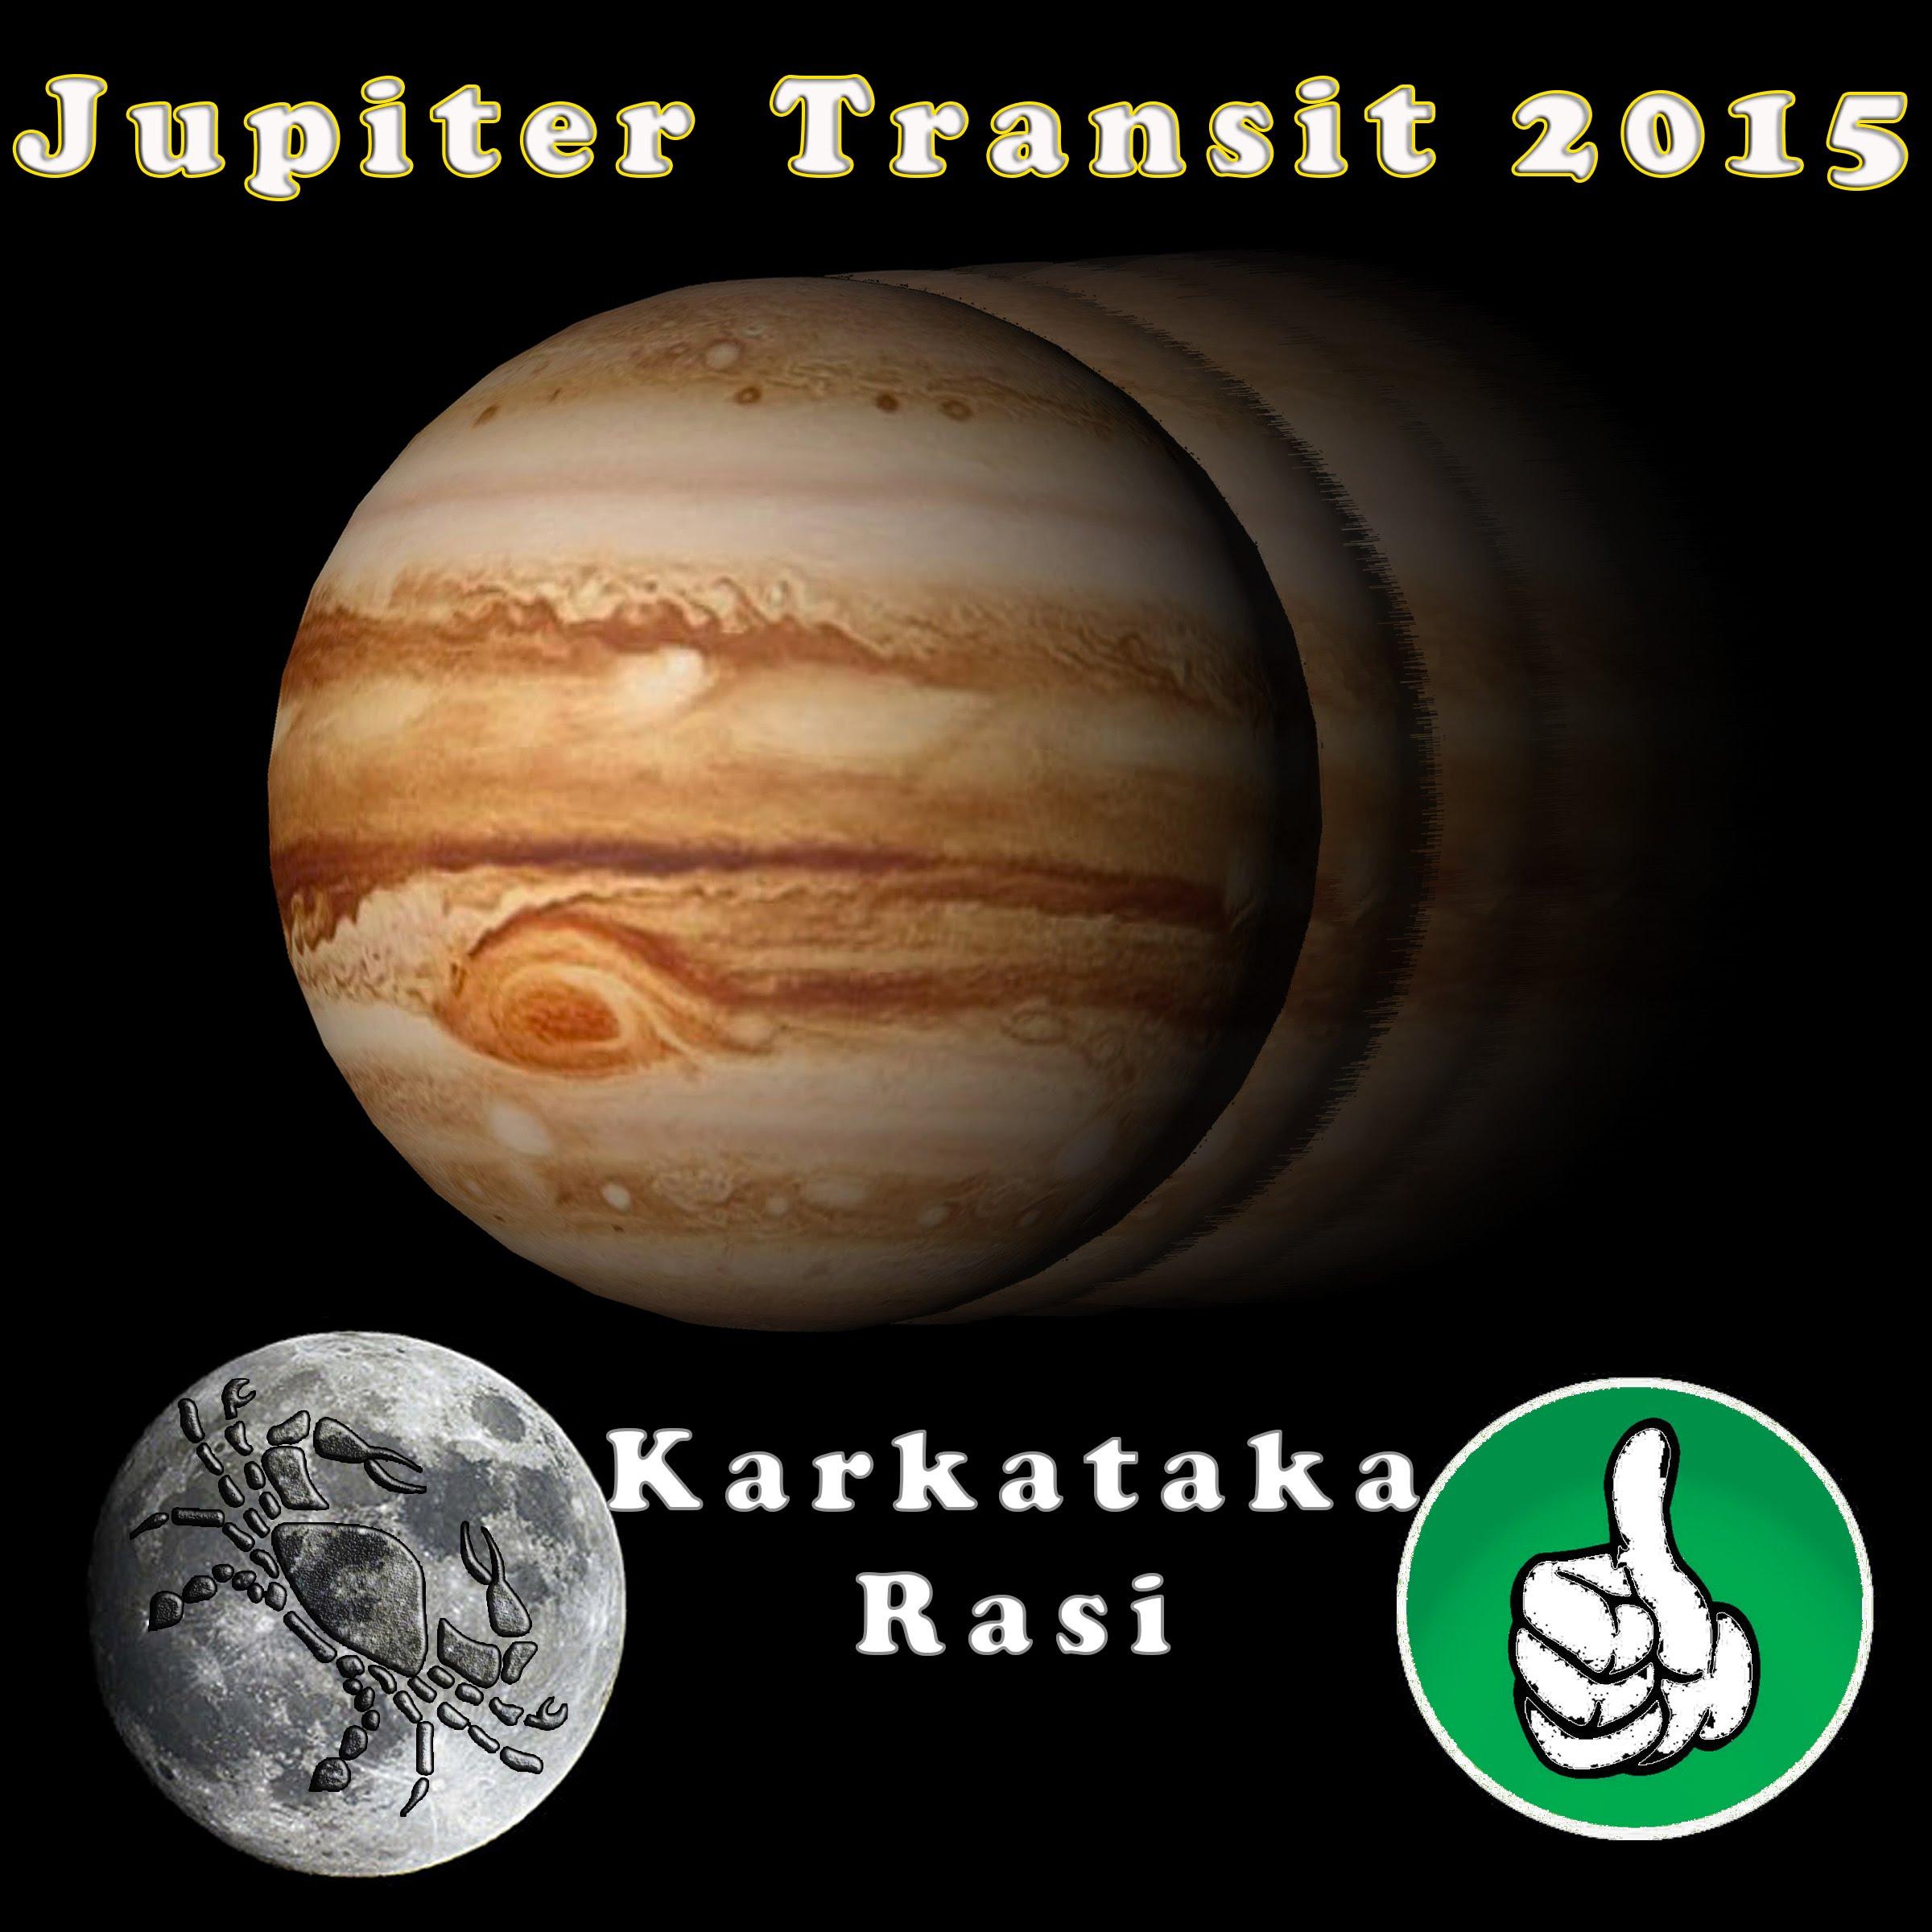 Jupiter Transit 2015 : Karkataka (Cancer) Moon Sign | E K